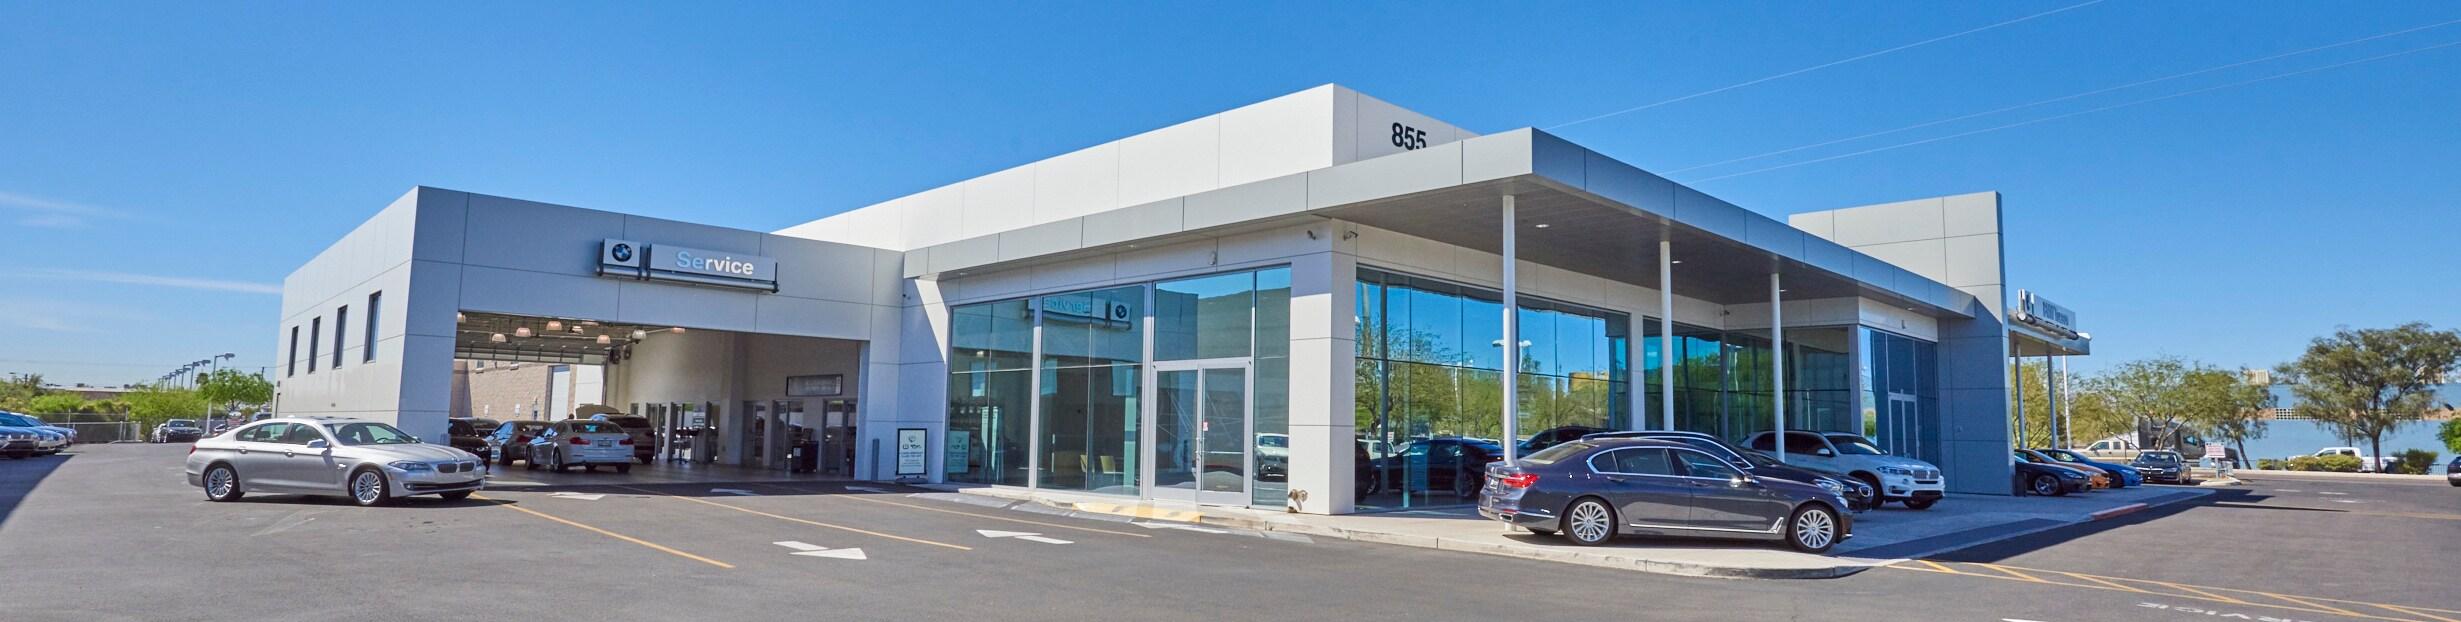 BMW Service Center Near Me | BMW of Tucson